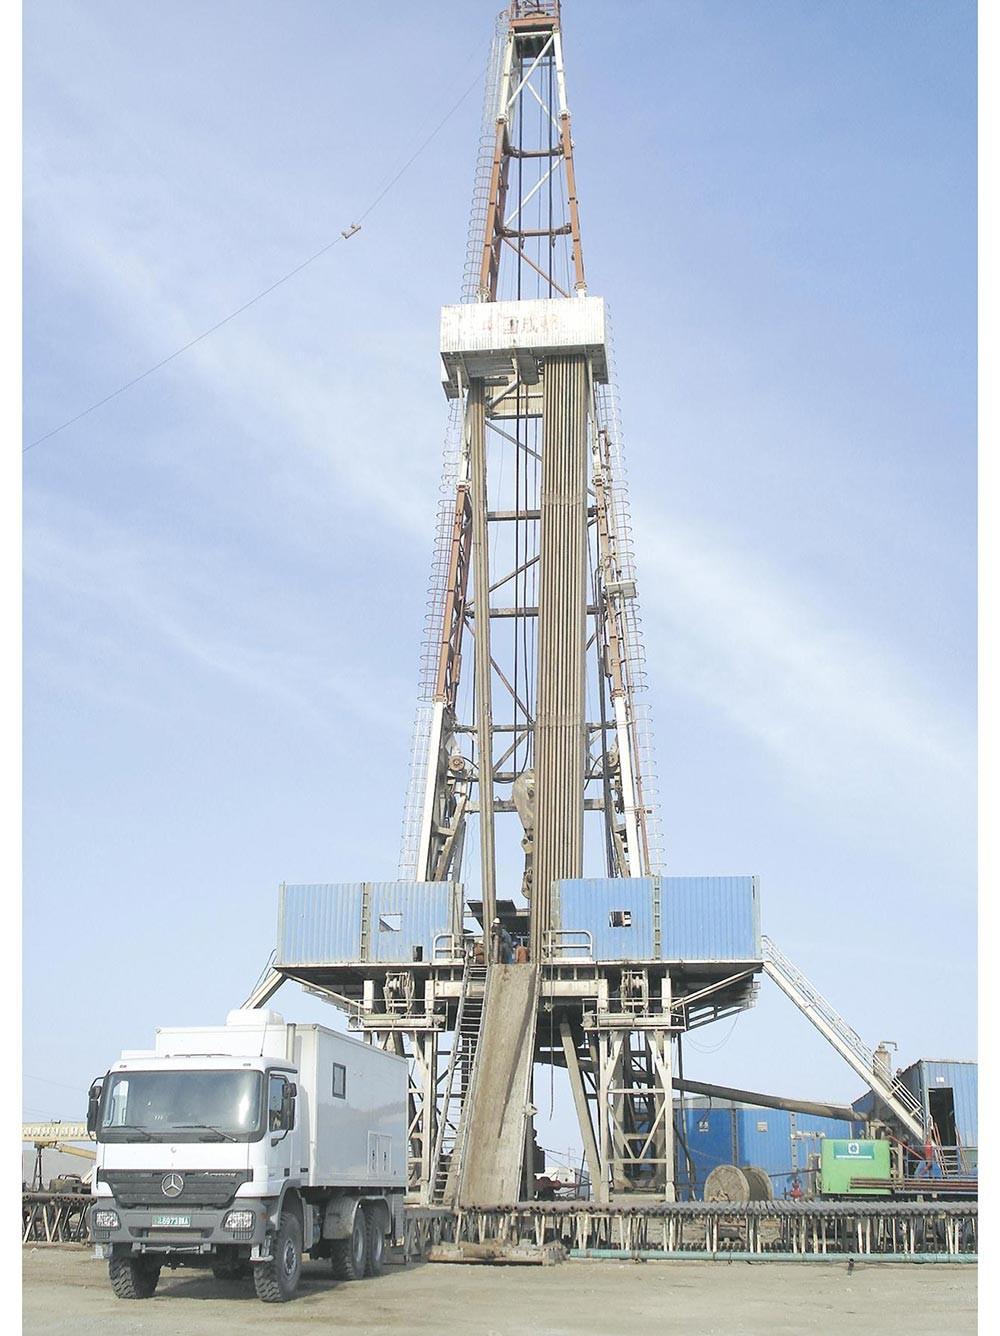 https://oilgas.gov.tm/storage/posts/2836/original-161248e16bcf6f.jpeg